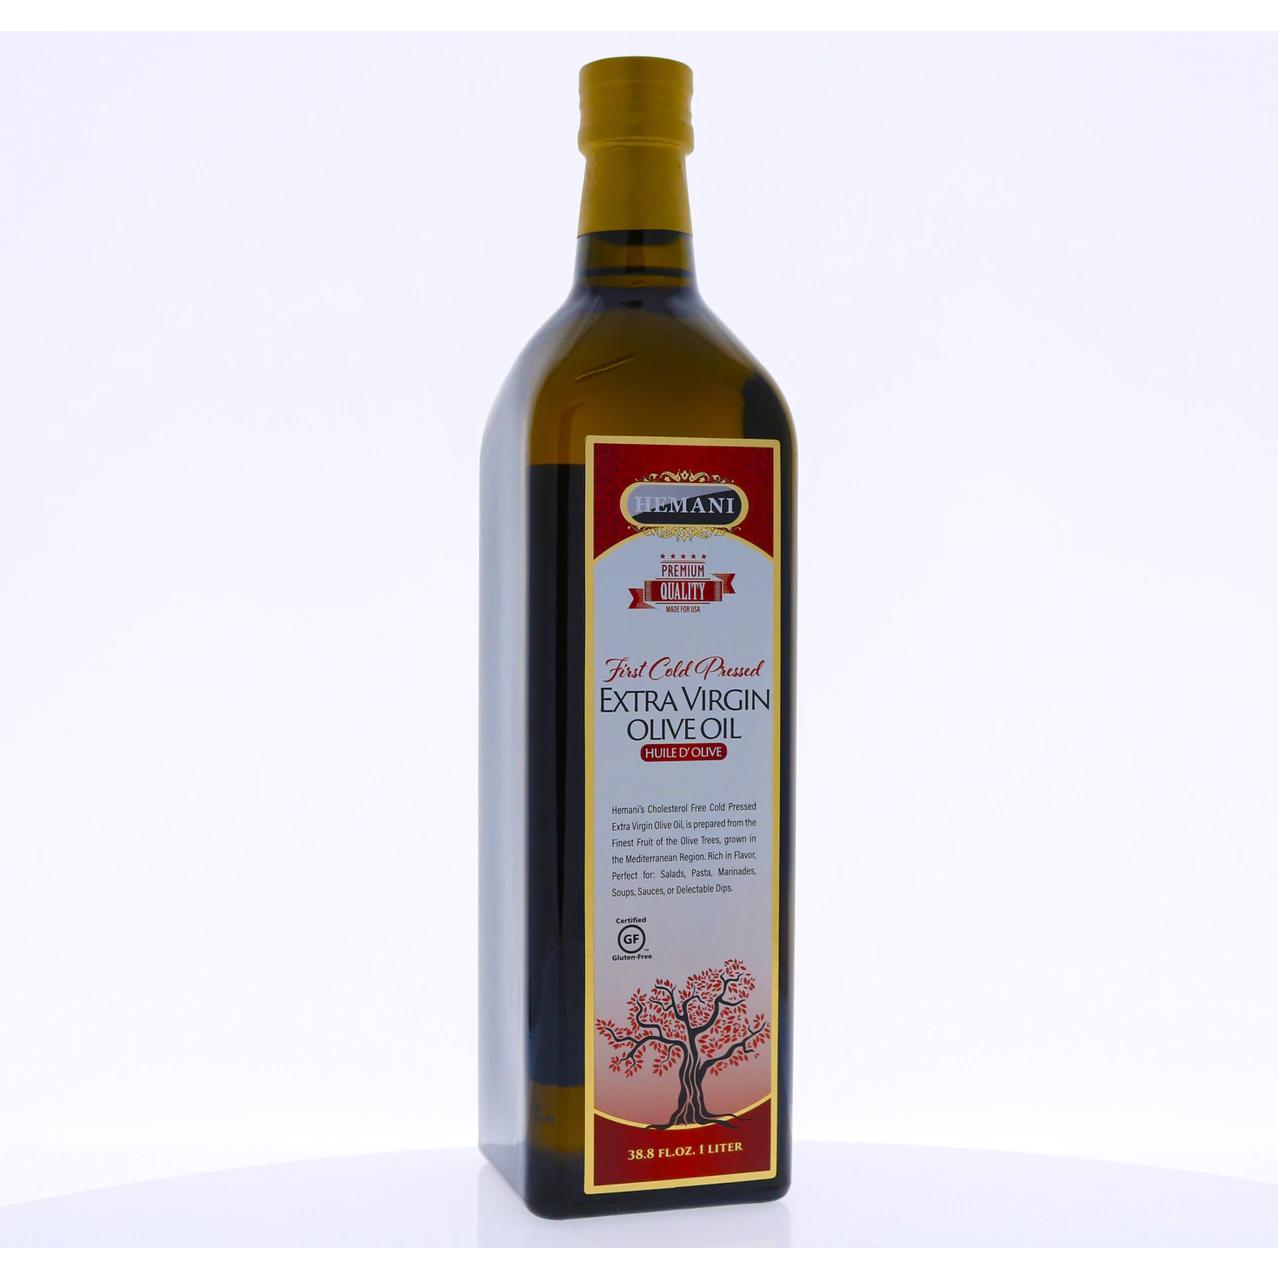 hermani extra virgin oil